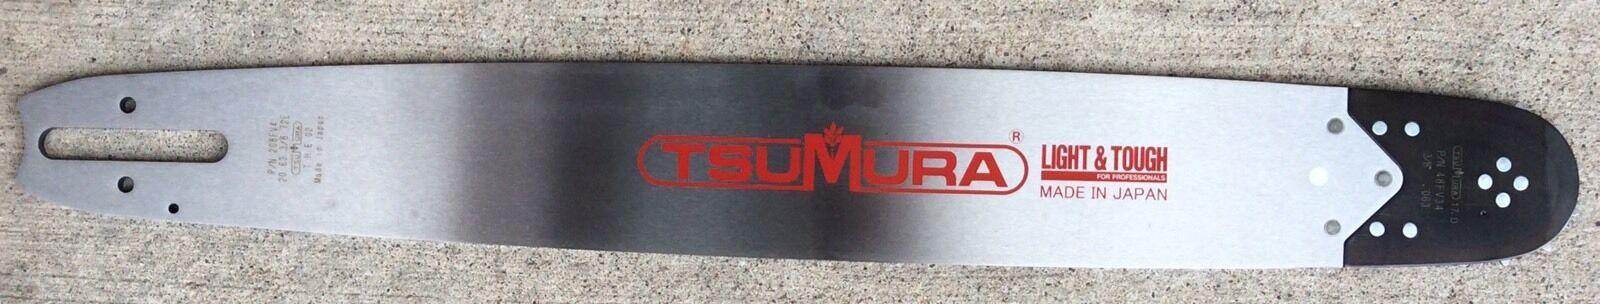 Guía de Tsumura 20  Bar 3 8-063-72DL Repl. Stihl 044 066 MS360 Oregon 203 rndd 025